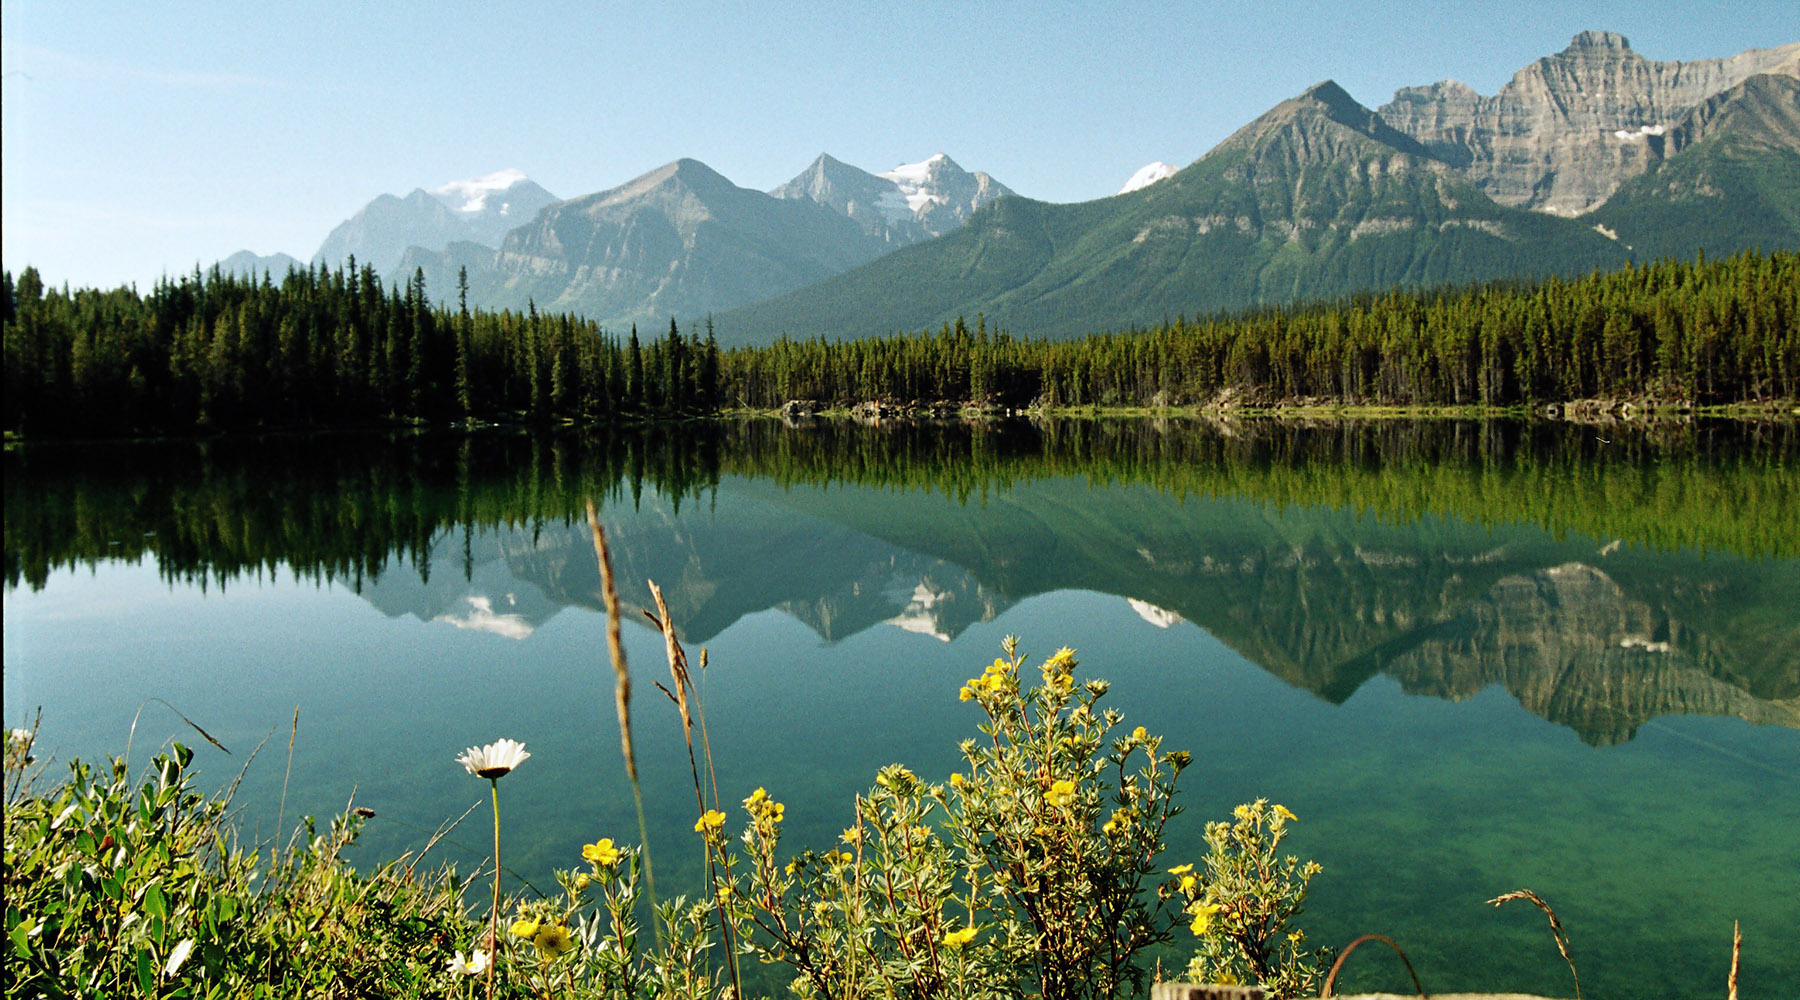 Rocheuses canadienne, Chinook voyages, aventure, randonnée, ouest canadien